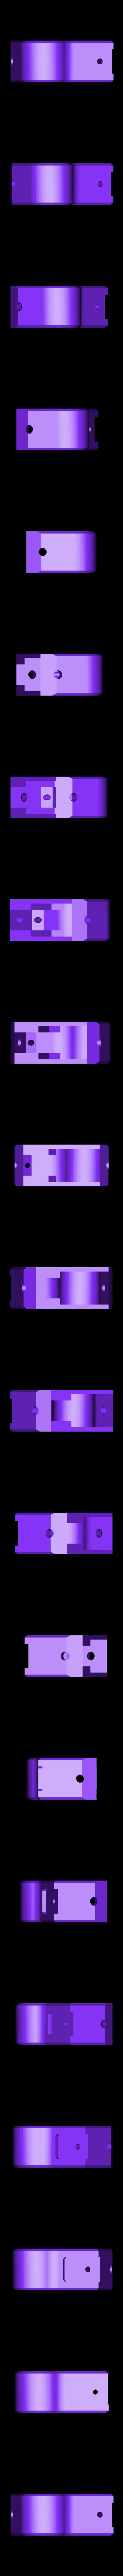 GearBox_V2.0.STL Download STL file 3D_Print_Follow_Focus_V2.0 • 3D printable template, SWANGLEI